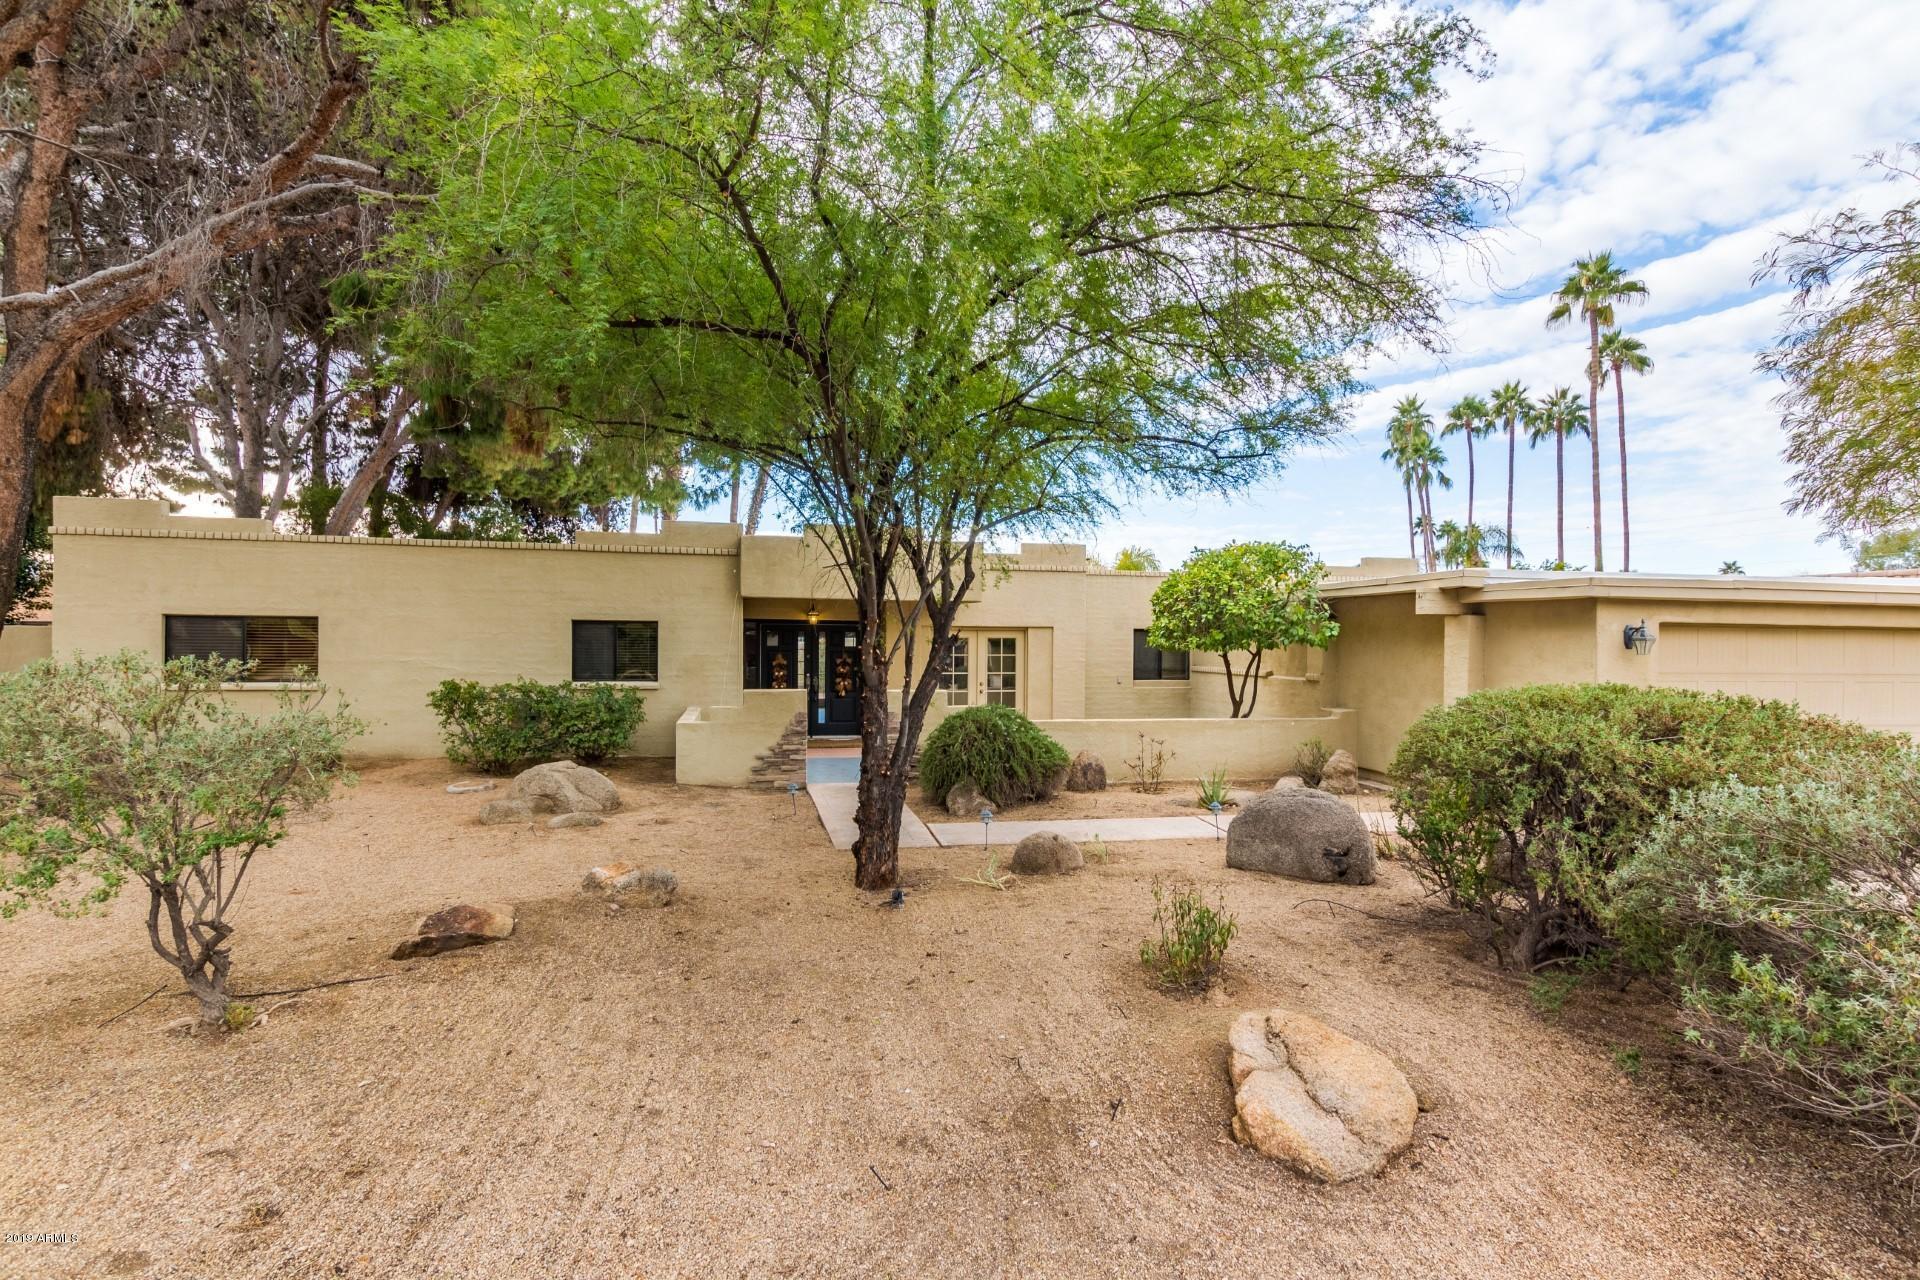 Photo for 215 W El Caminito Drive, Phoenix, AZ 85021 (MLS # 5896659)